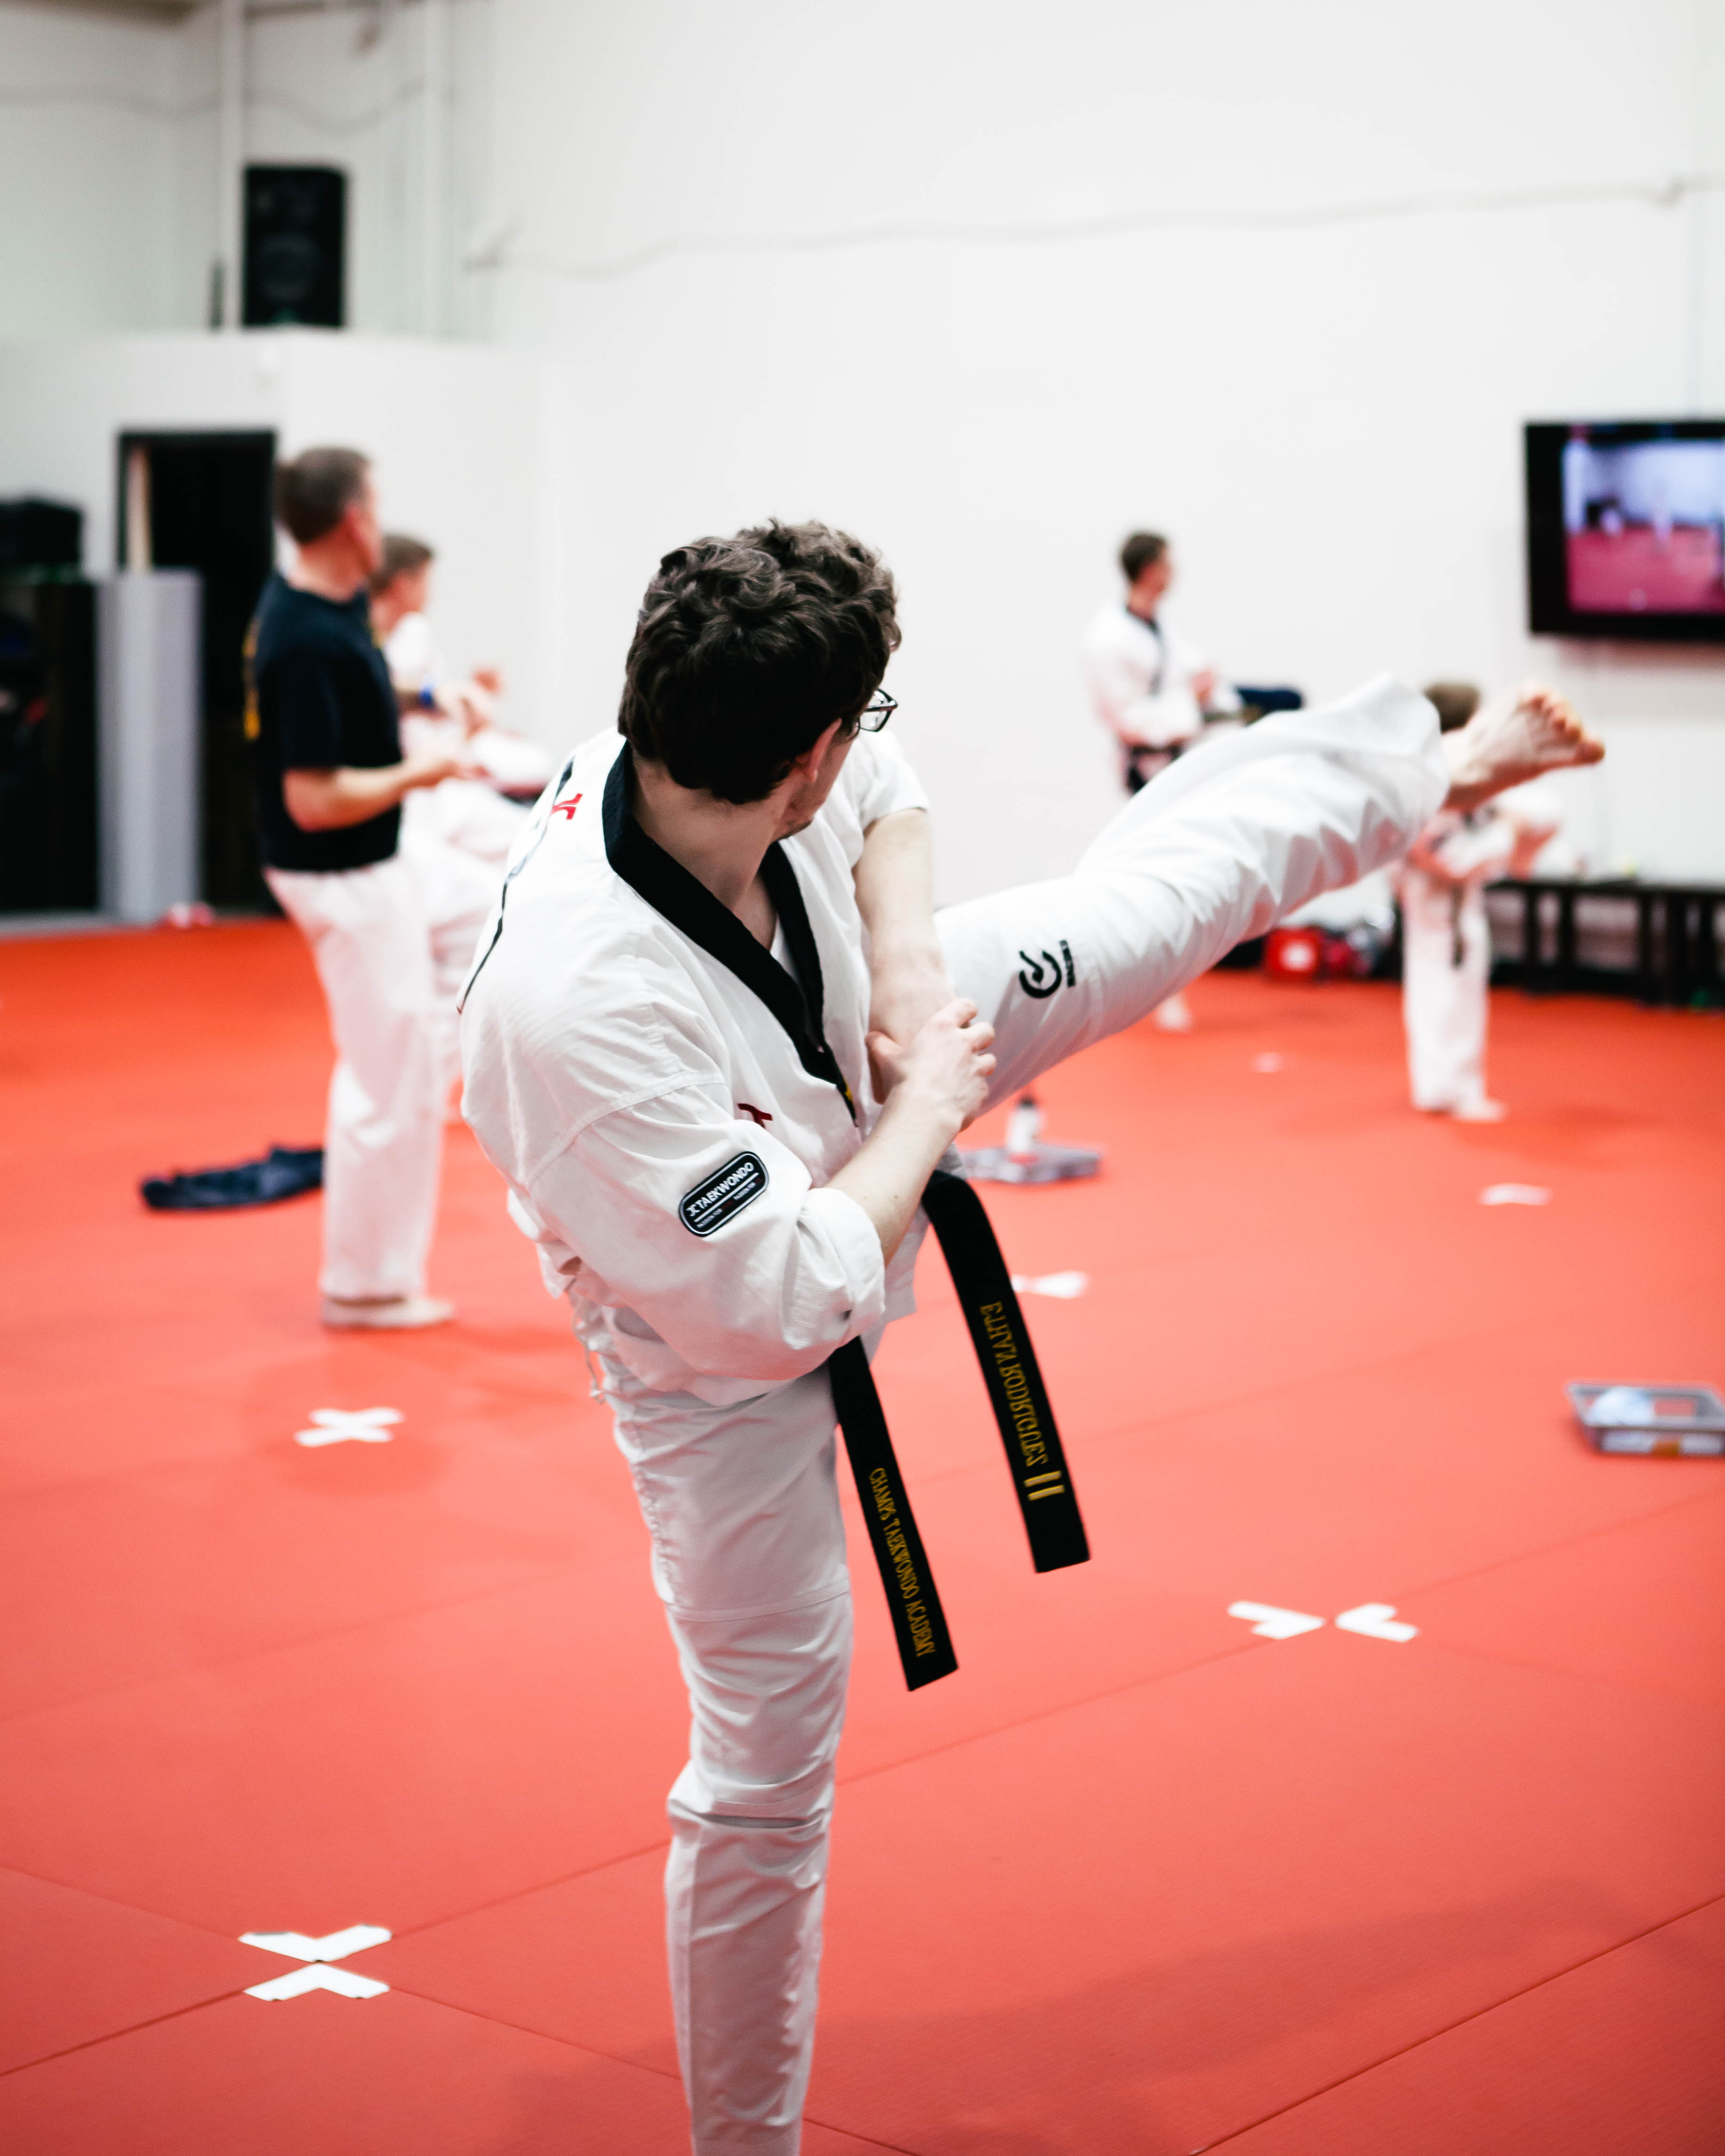 A teenager training Taekwondo